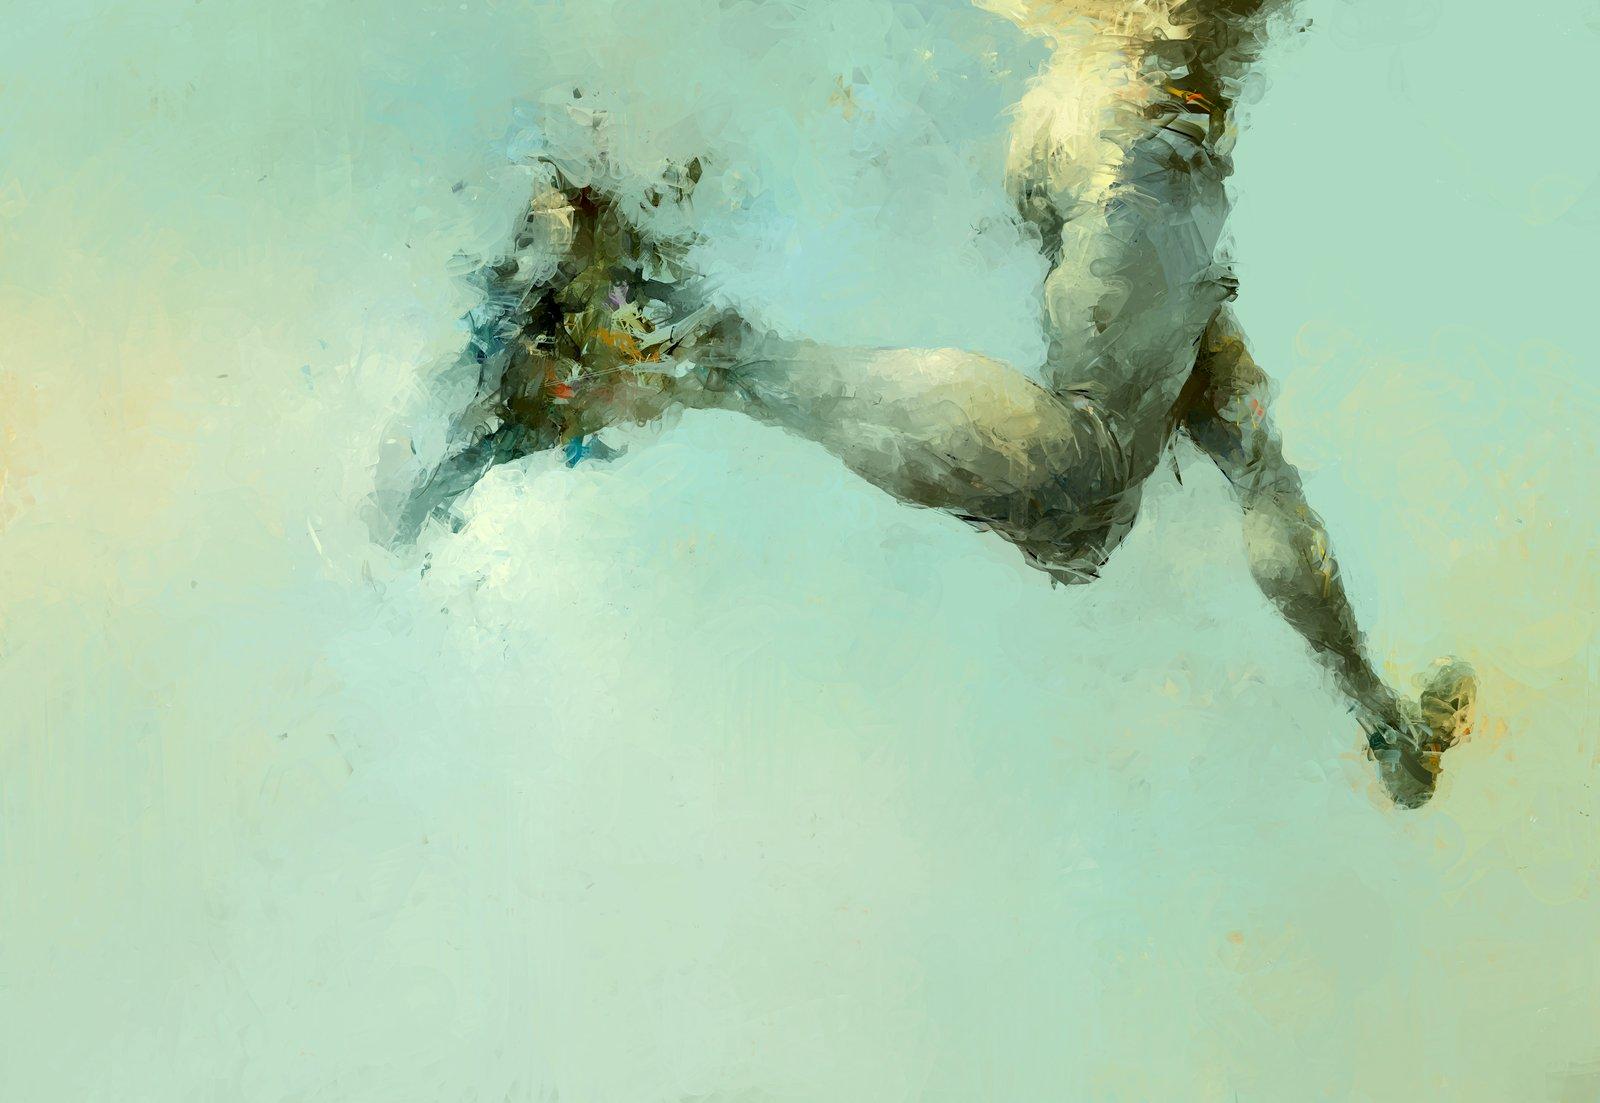 Jump. Artwork by Anderzak, zalas: